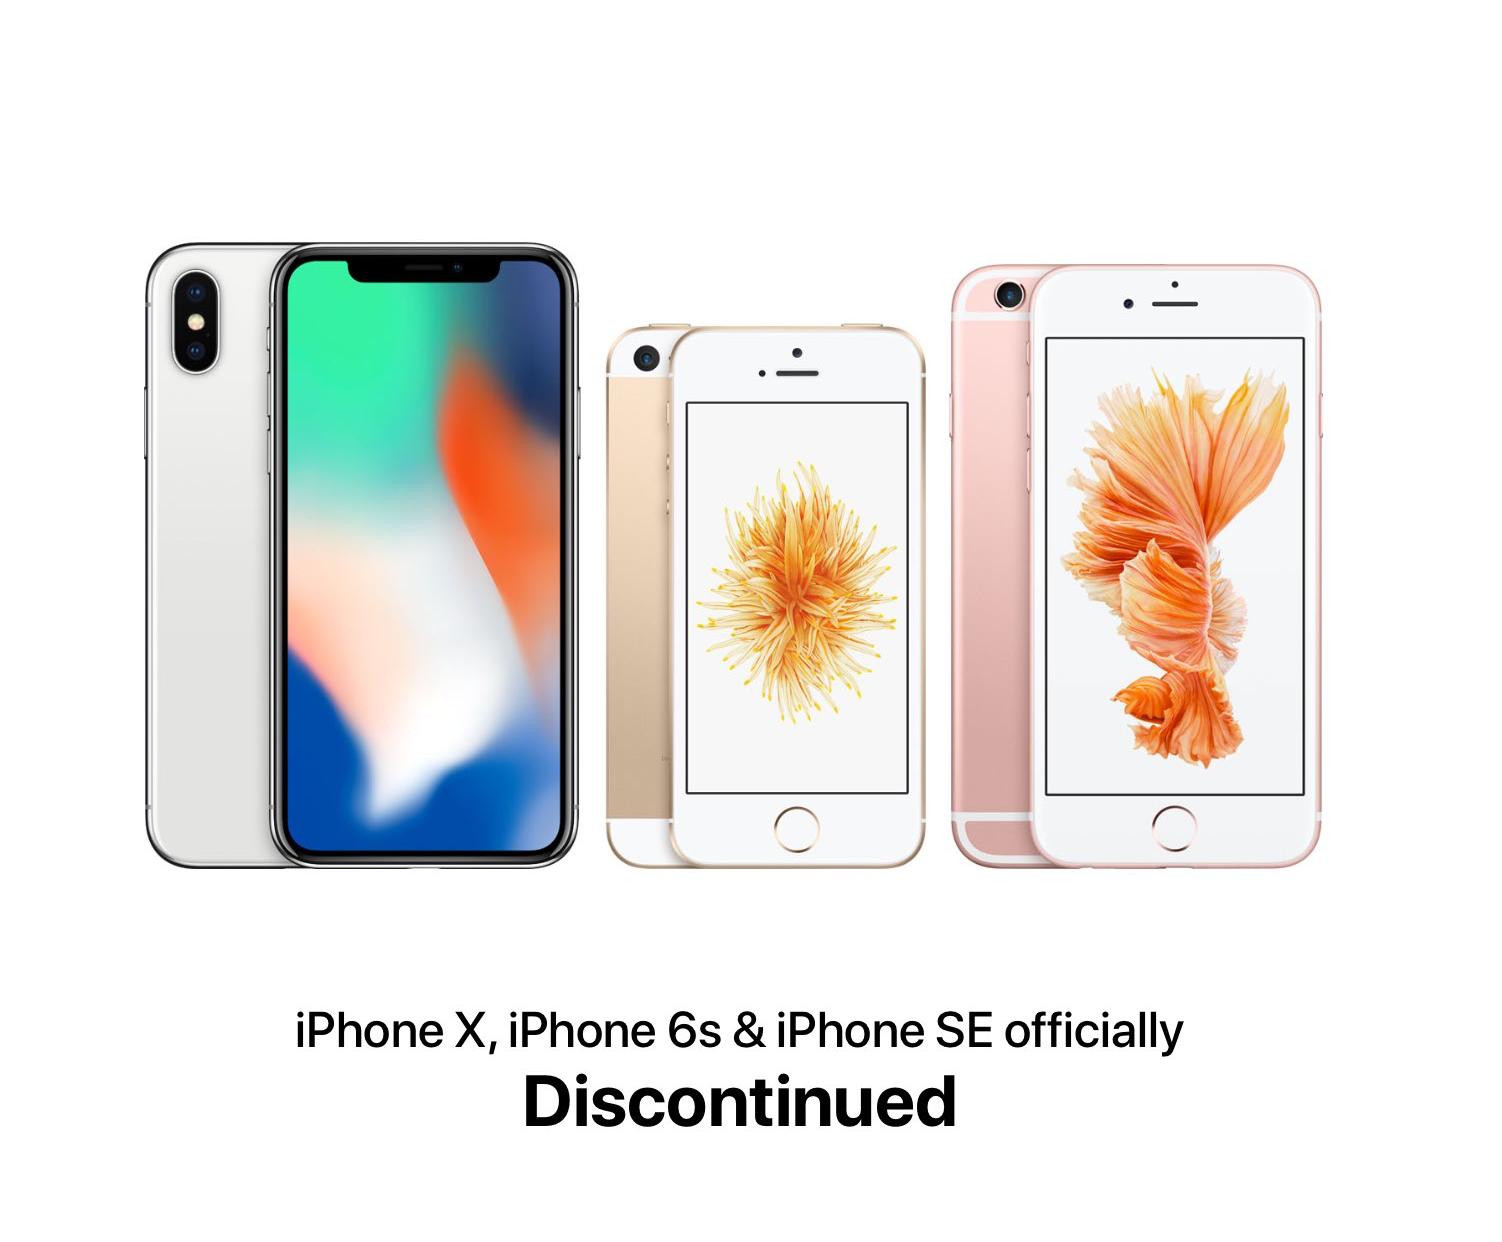 iPhone X နဲ႔ iPhone SE ထုတႅဳပၼႈကို Apple ရပၧိဳင္း